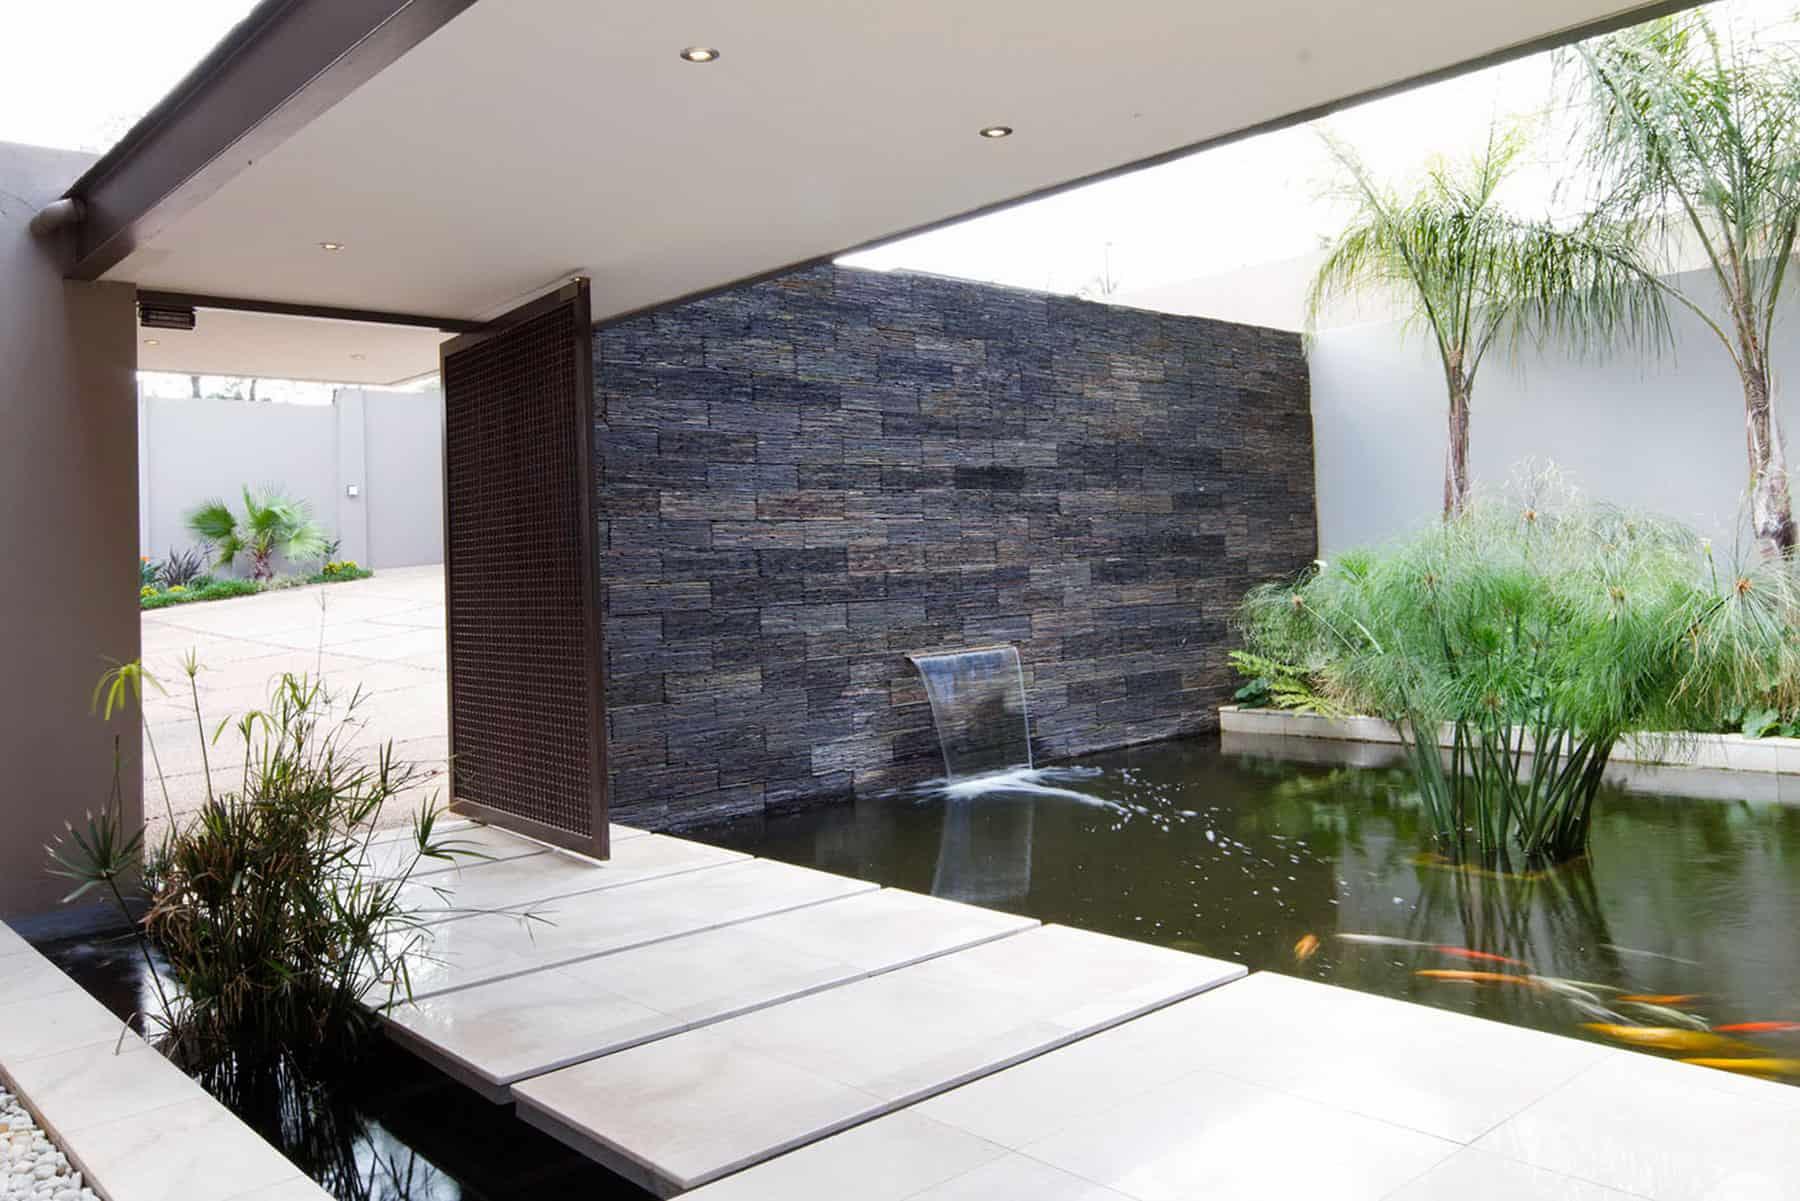 House Sed by Nico van der Meulen Architects (1)